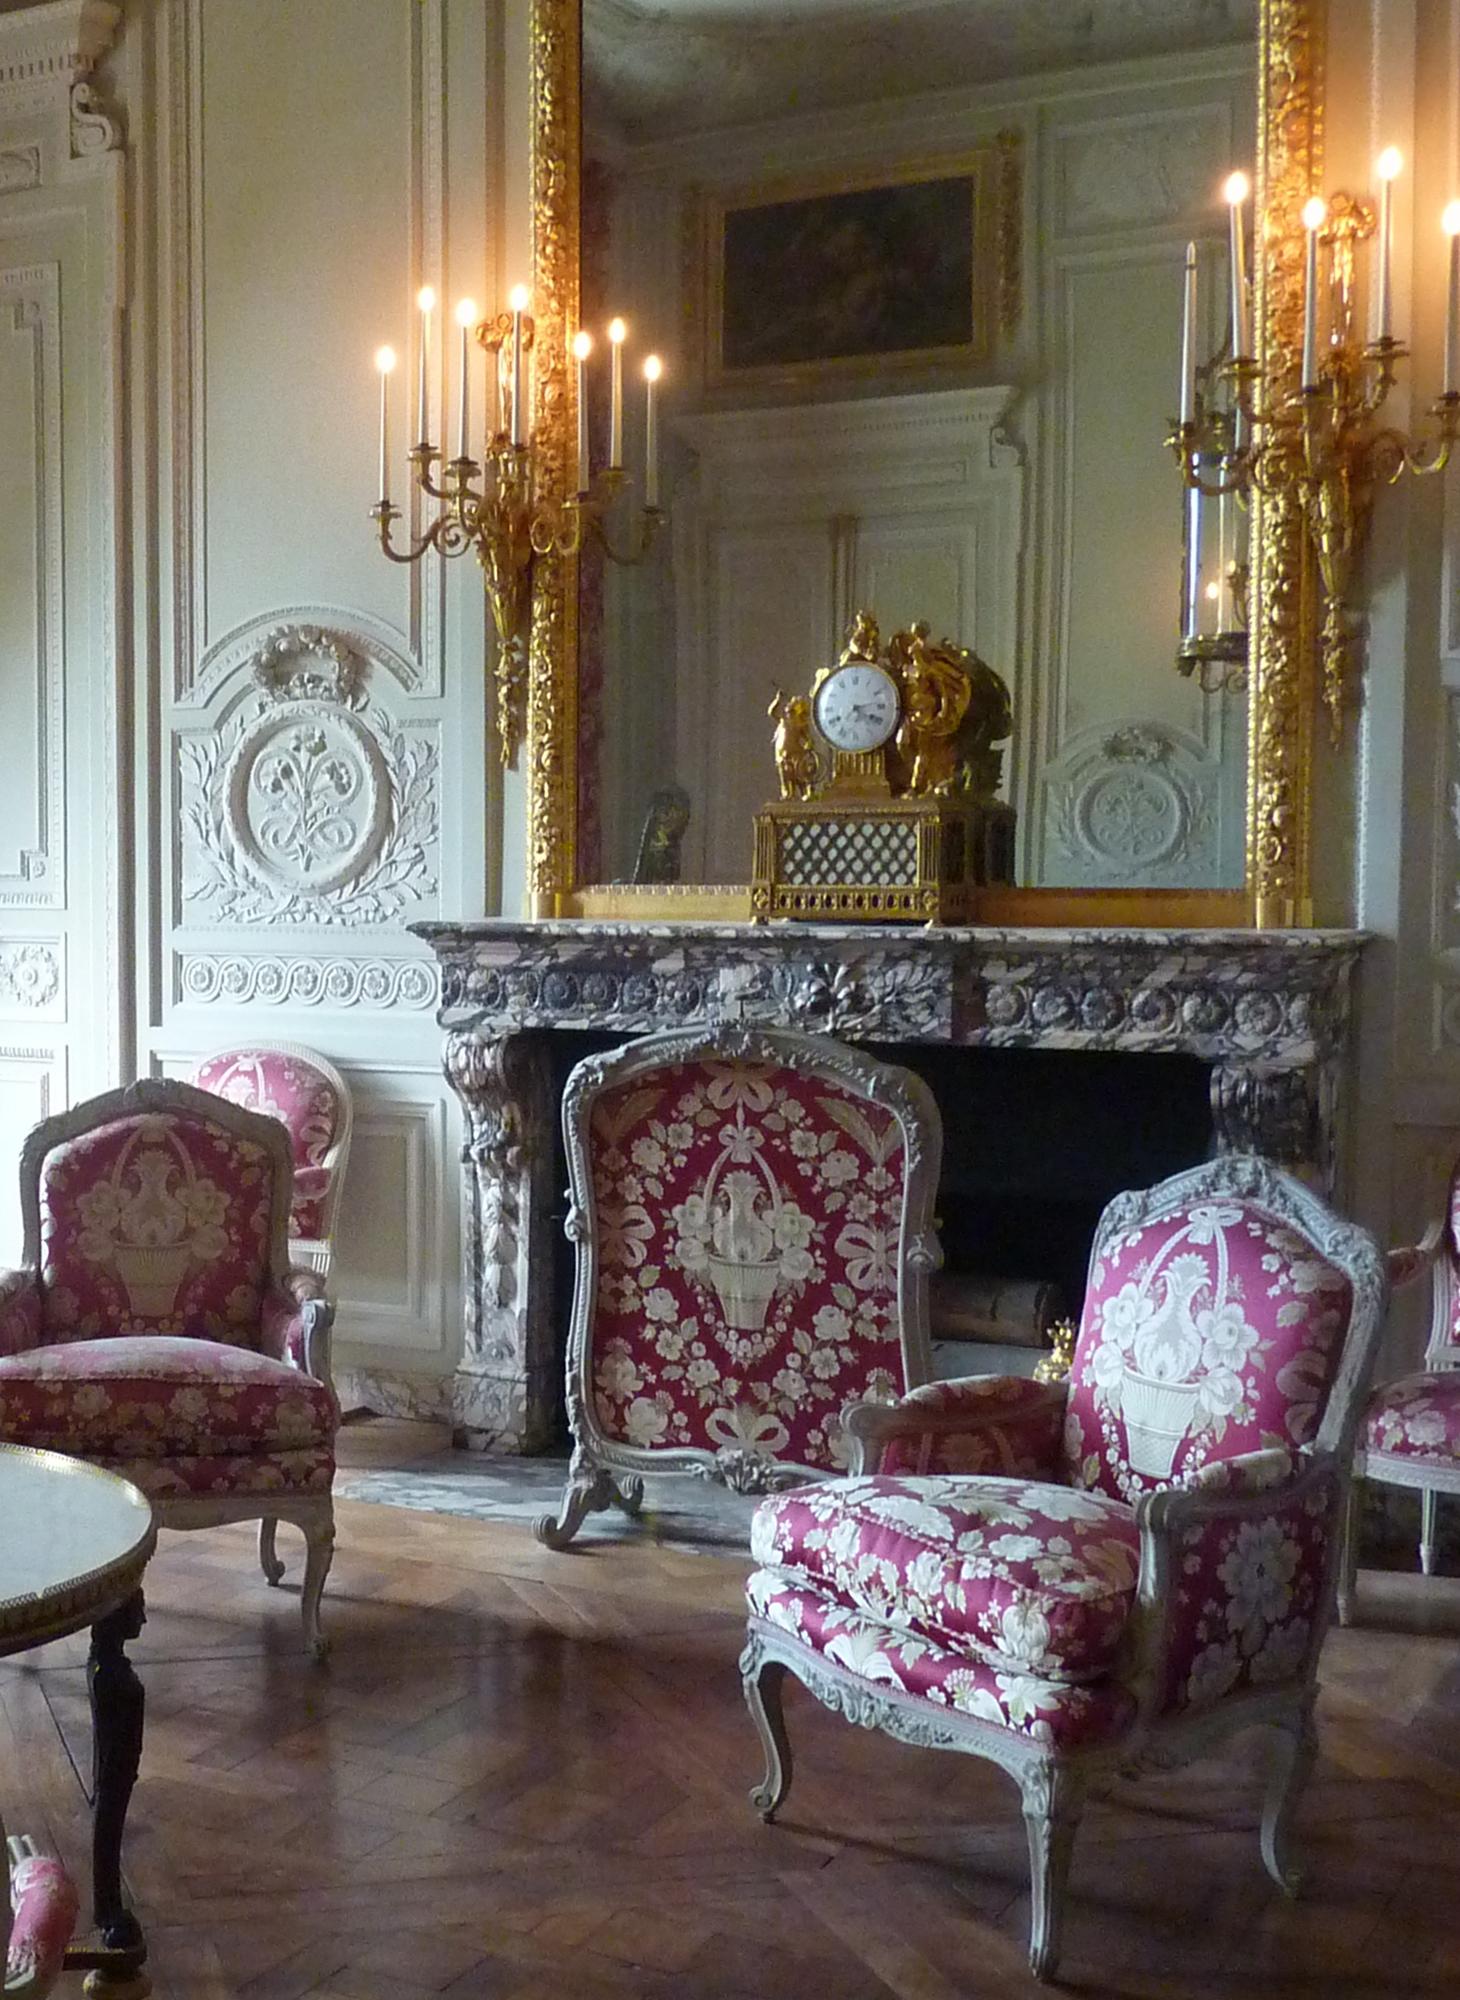 file salon du petit trianon appliques de thomire jpg wikimedia commons. Black Bedroom Furniture Sets. Home Design Ideas